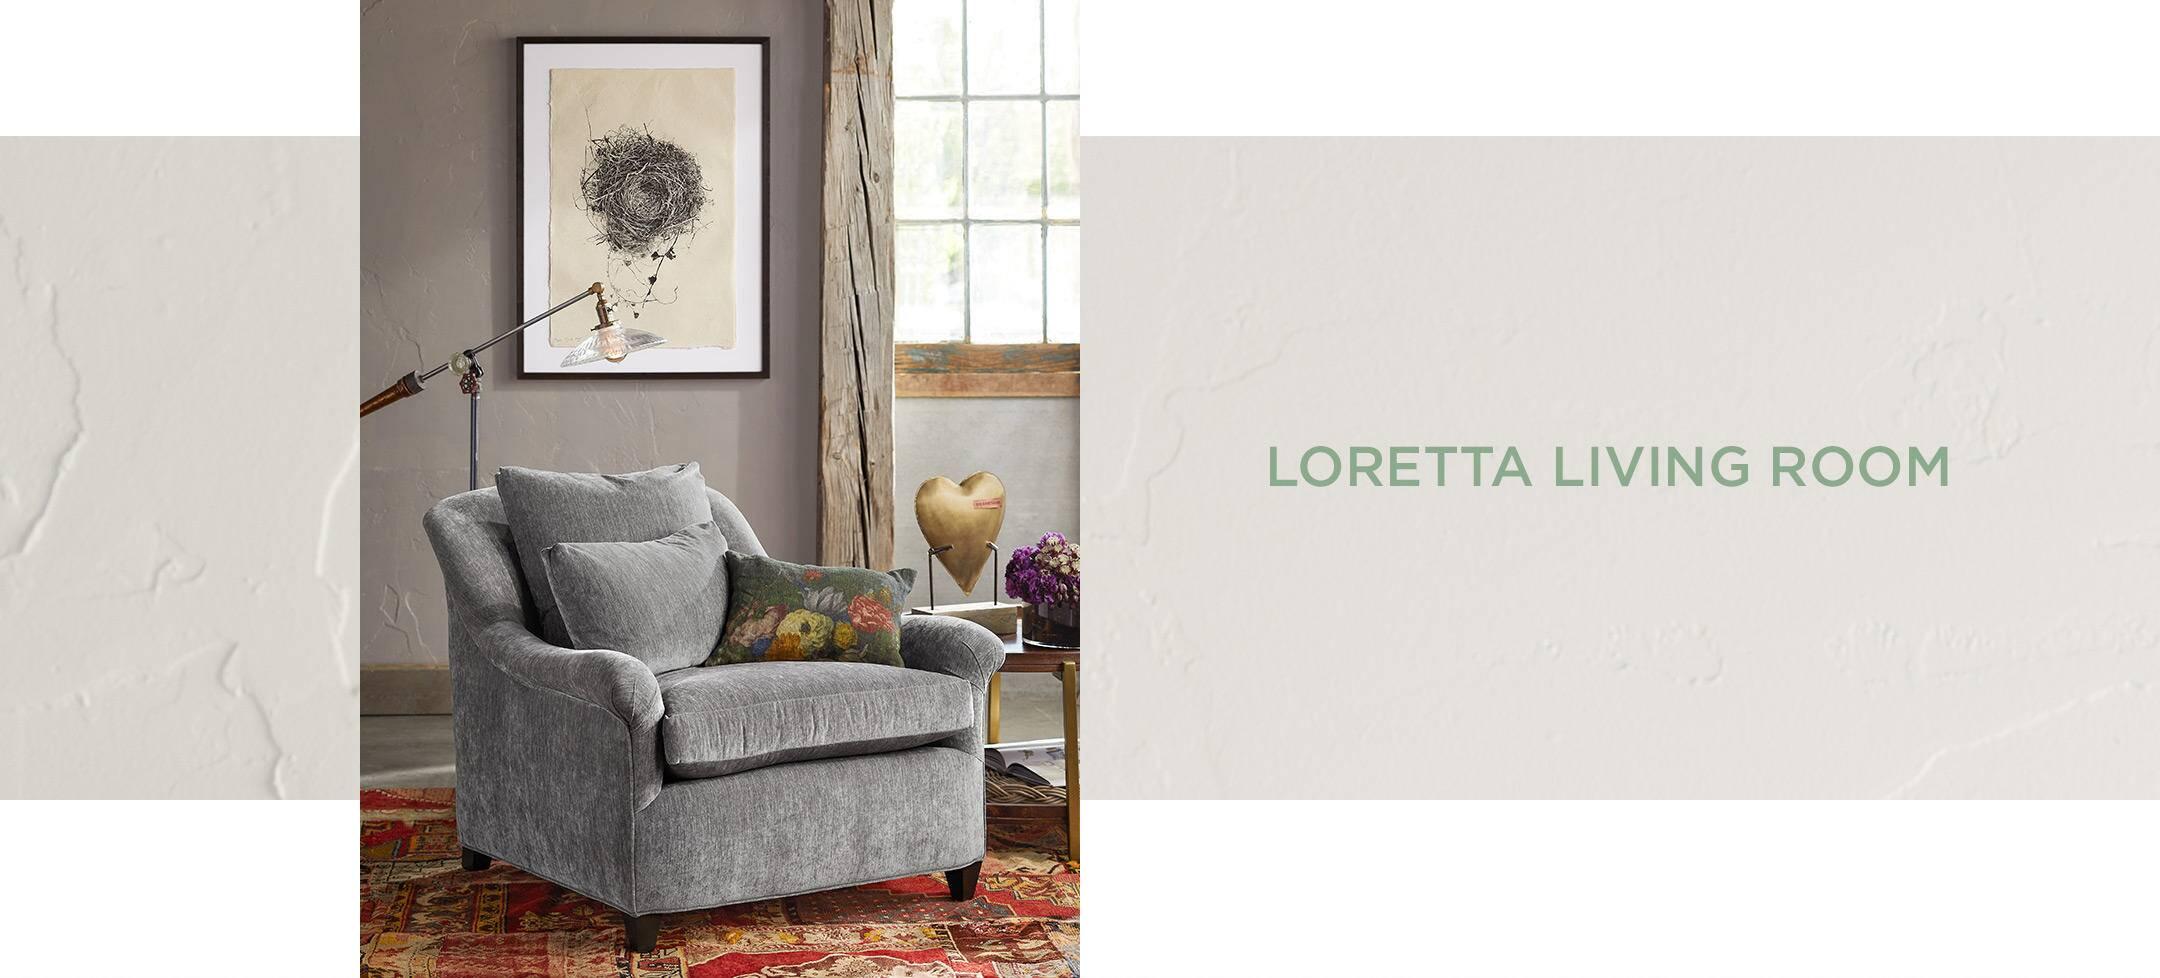 Loretta Living Room